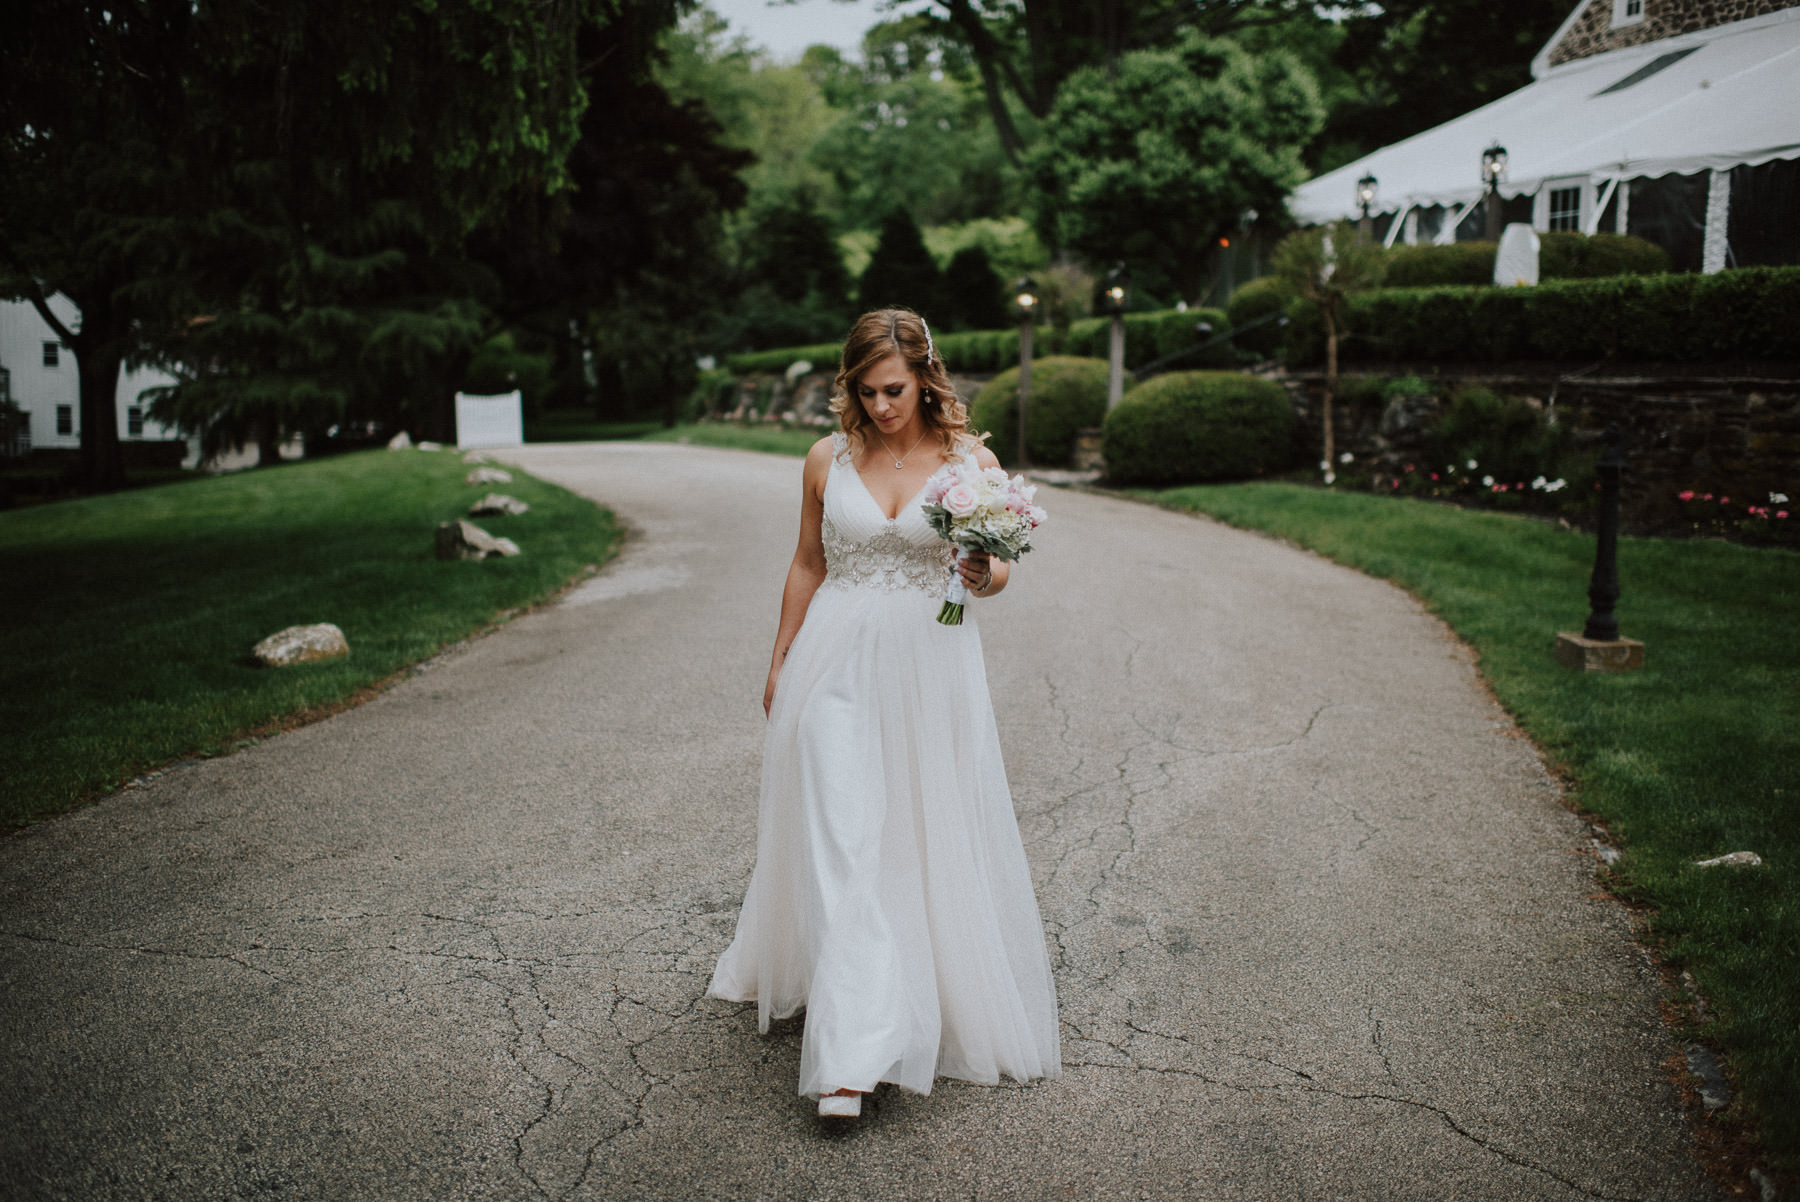 appleford-estate-wedding-photography-25.jpg